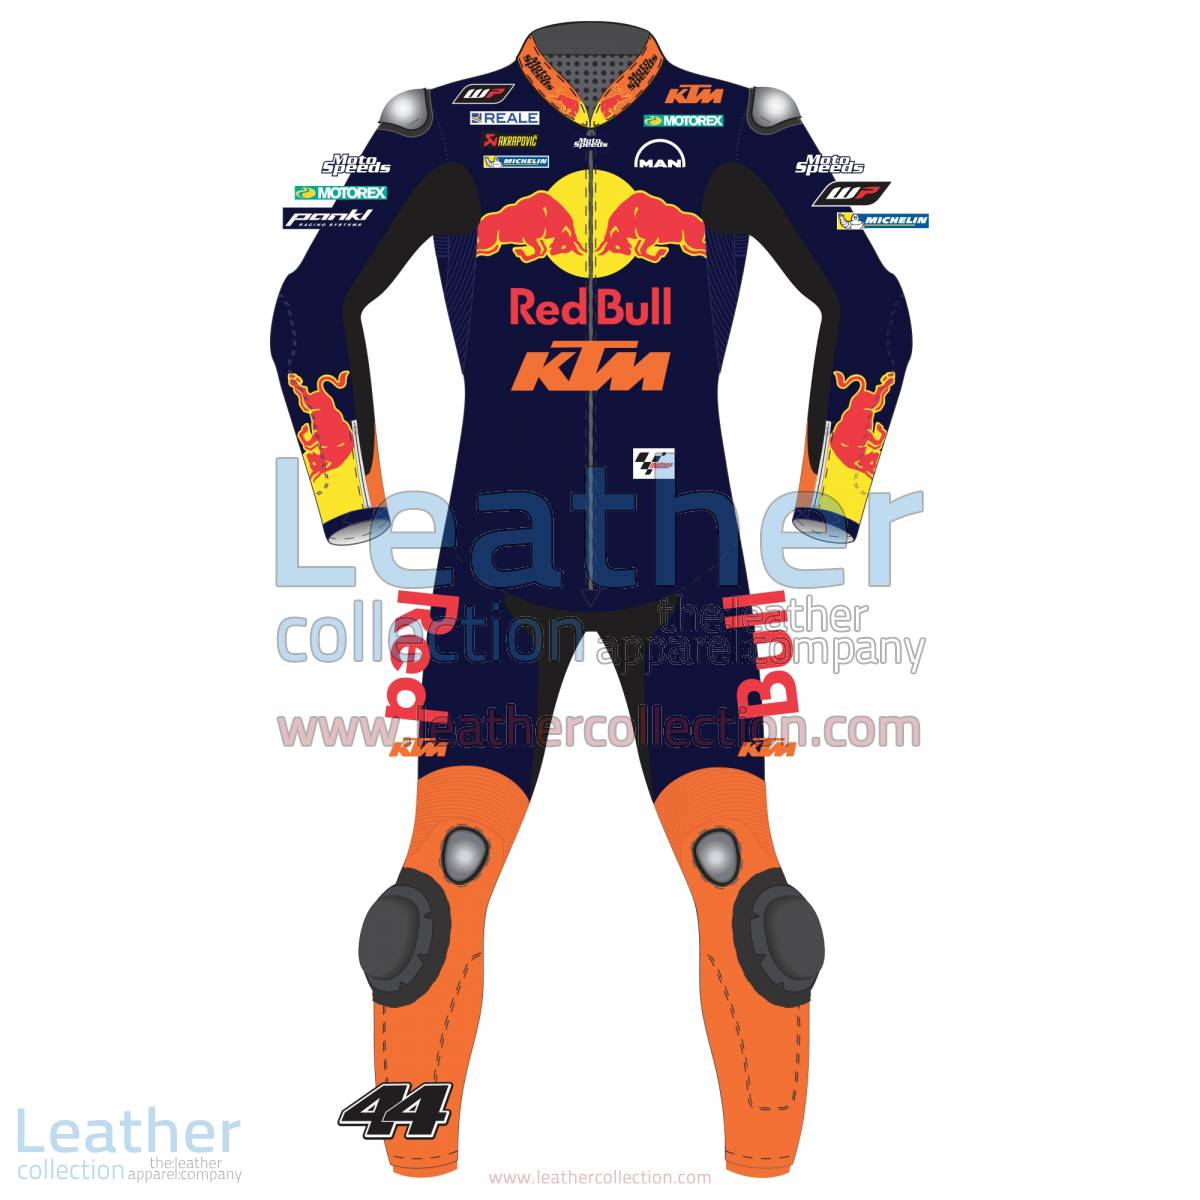 Pol Espargaro Red Bull KTM MotoGP 2017 Leather Suit   Pol Espargaro Red Bull KTM MotoGP 2017 Leather Suit